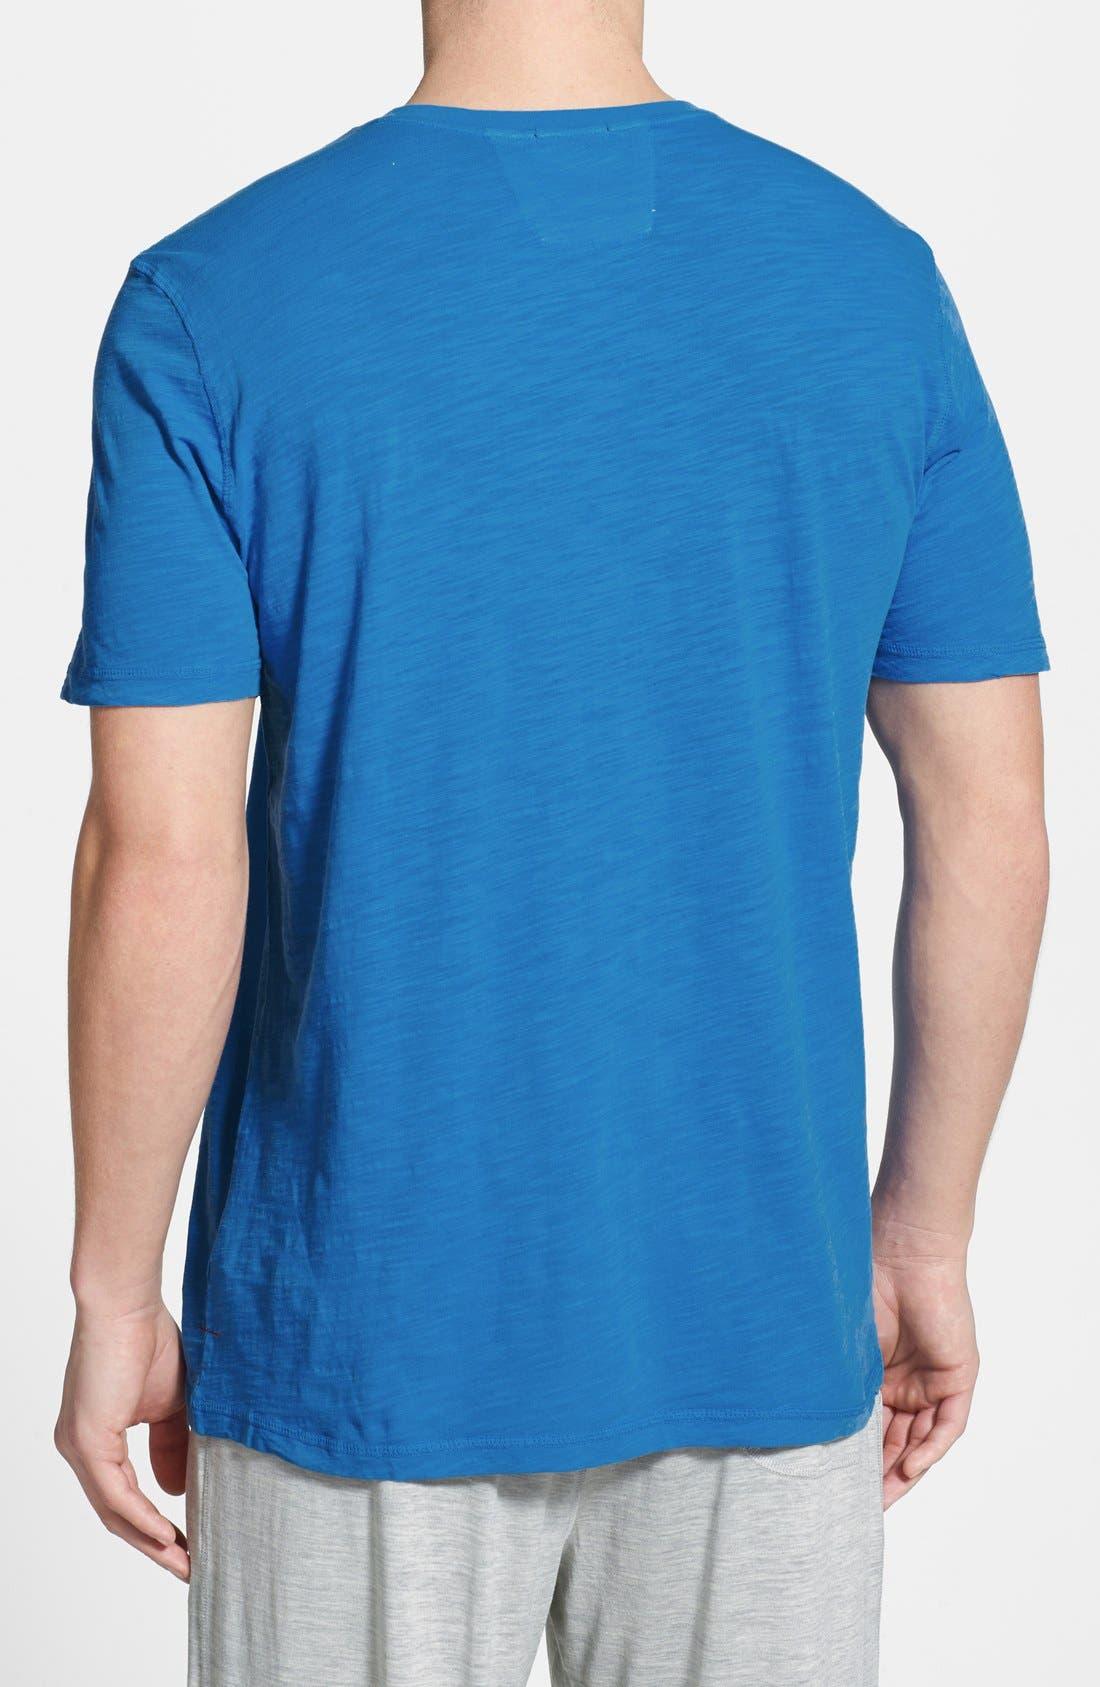 Alternate Image 2  - Daniel Buchler Cotton Slub T-Shirt